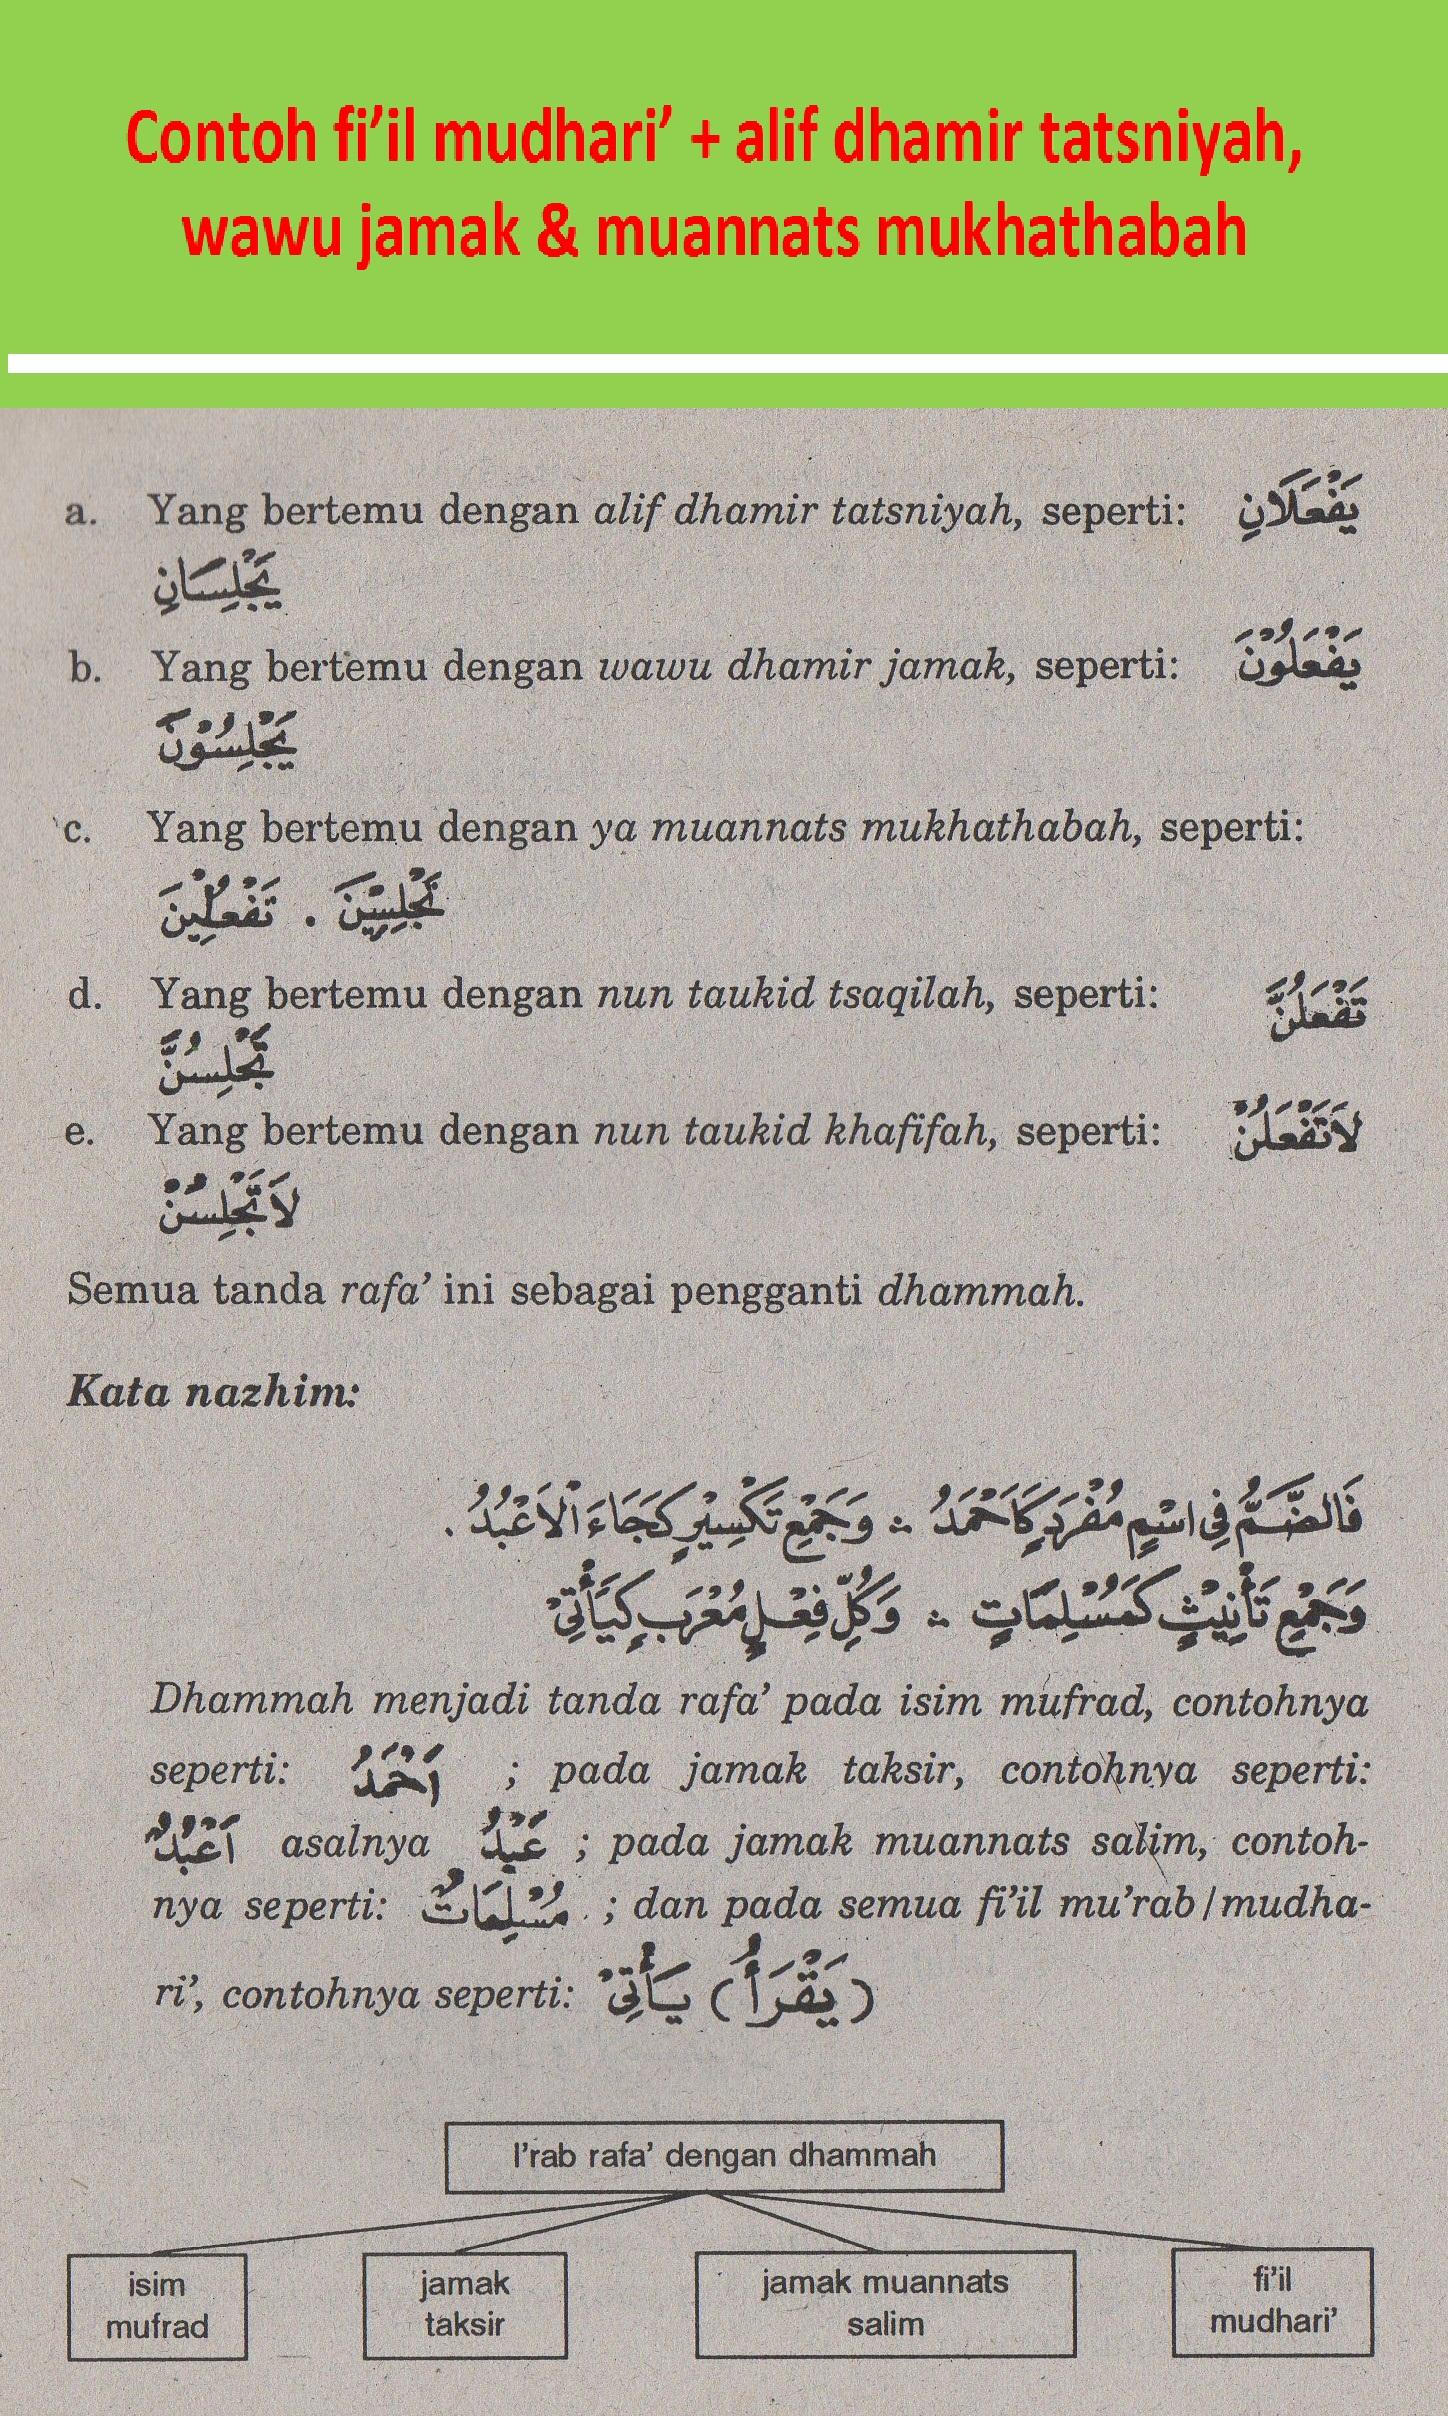 belajar bahasa arab nahu shorof contoh fiil mudhari alif dhamir tatsniyah wawu jamak